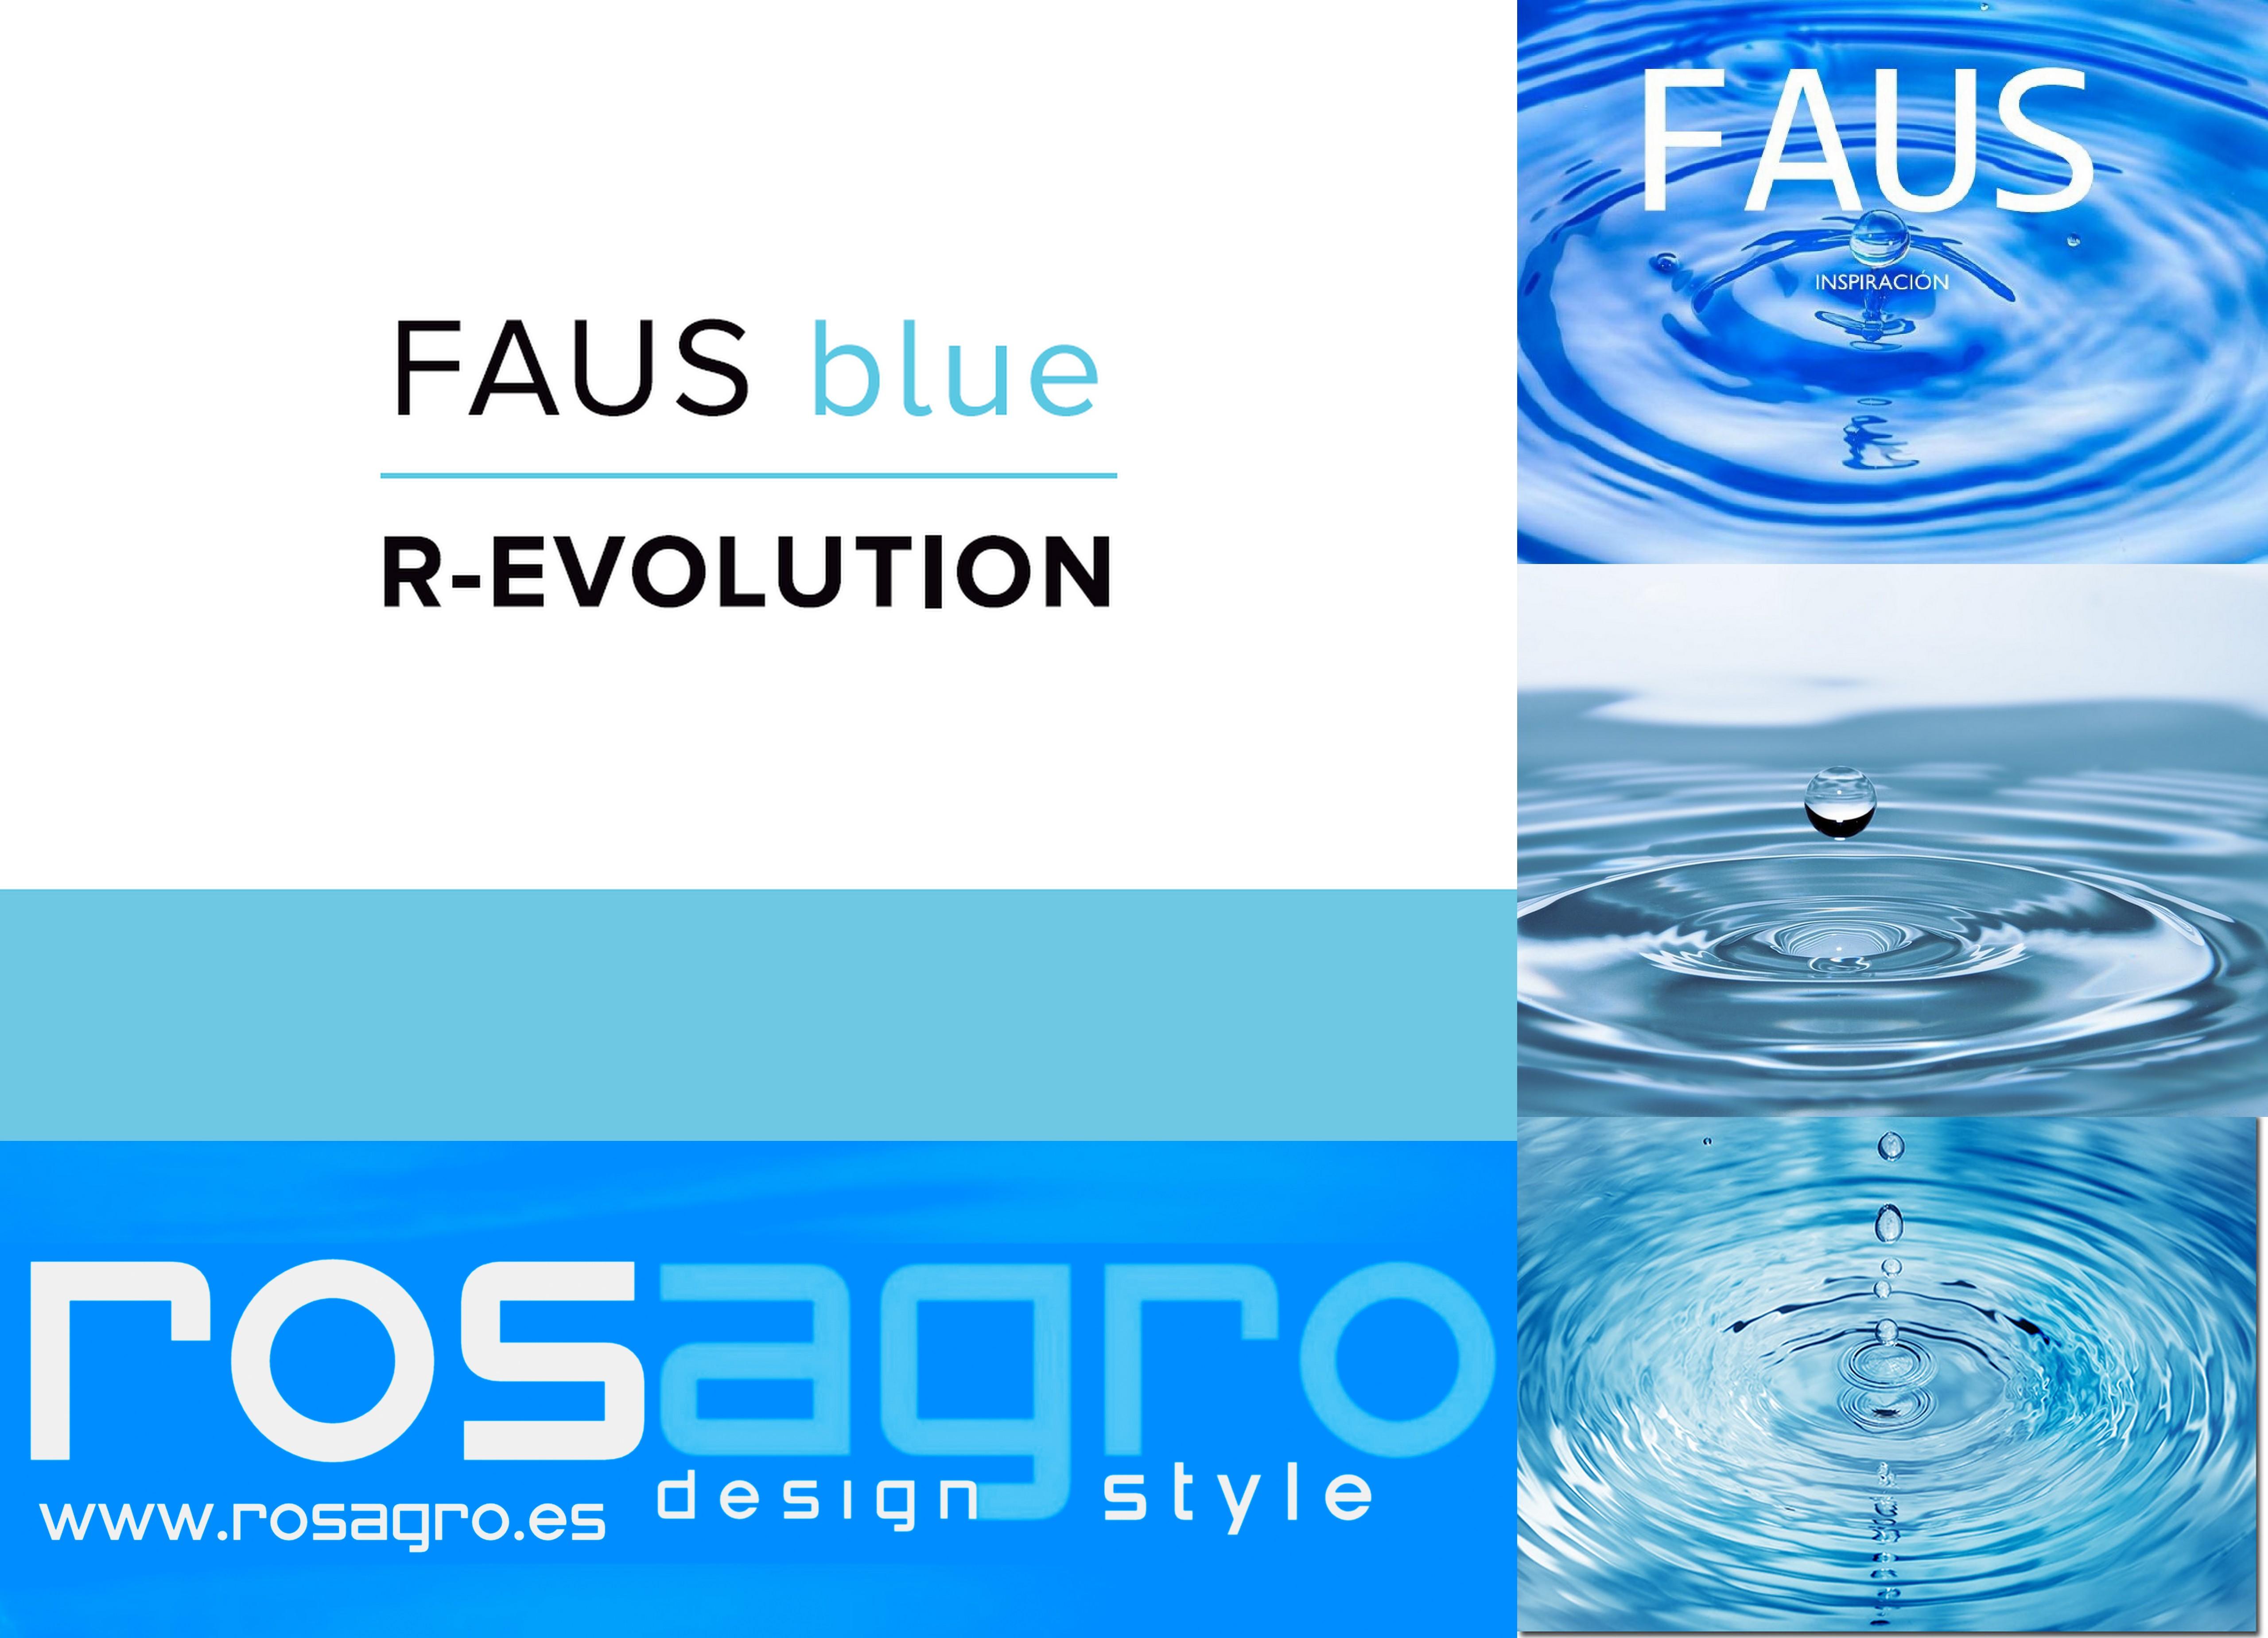 FAUS R-EVOLUTION BLUE VINILICO